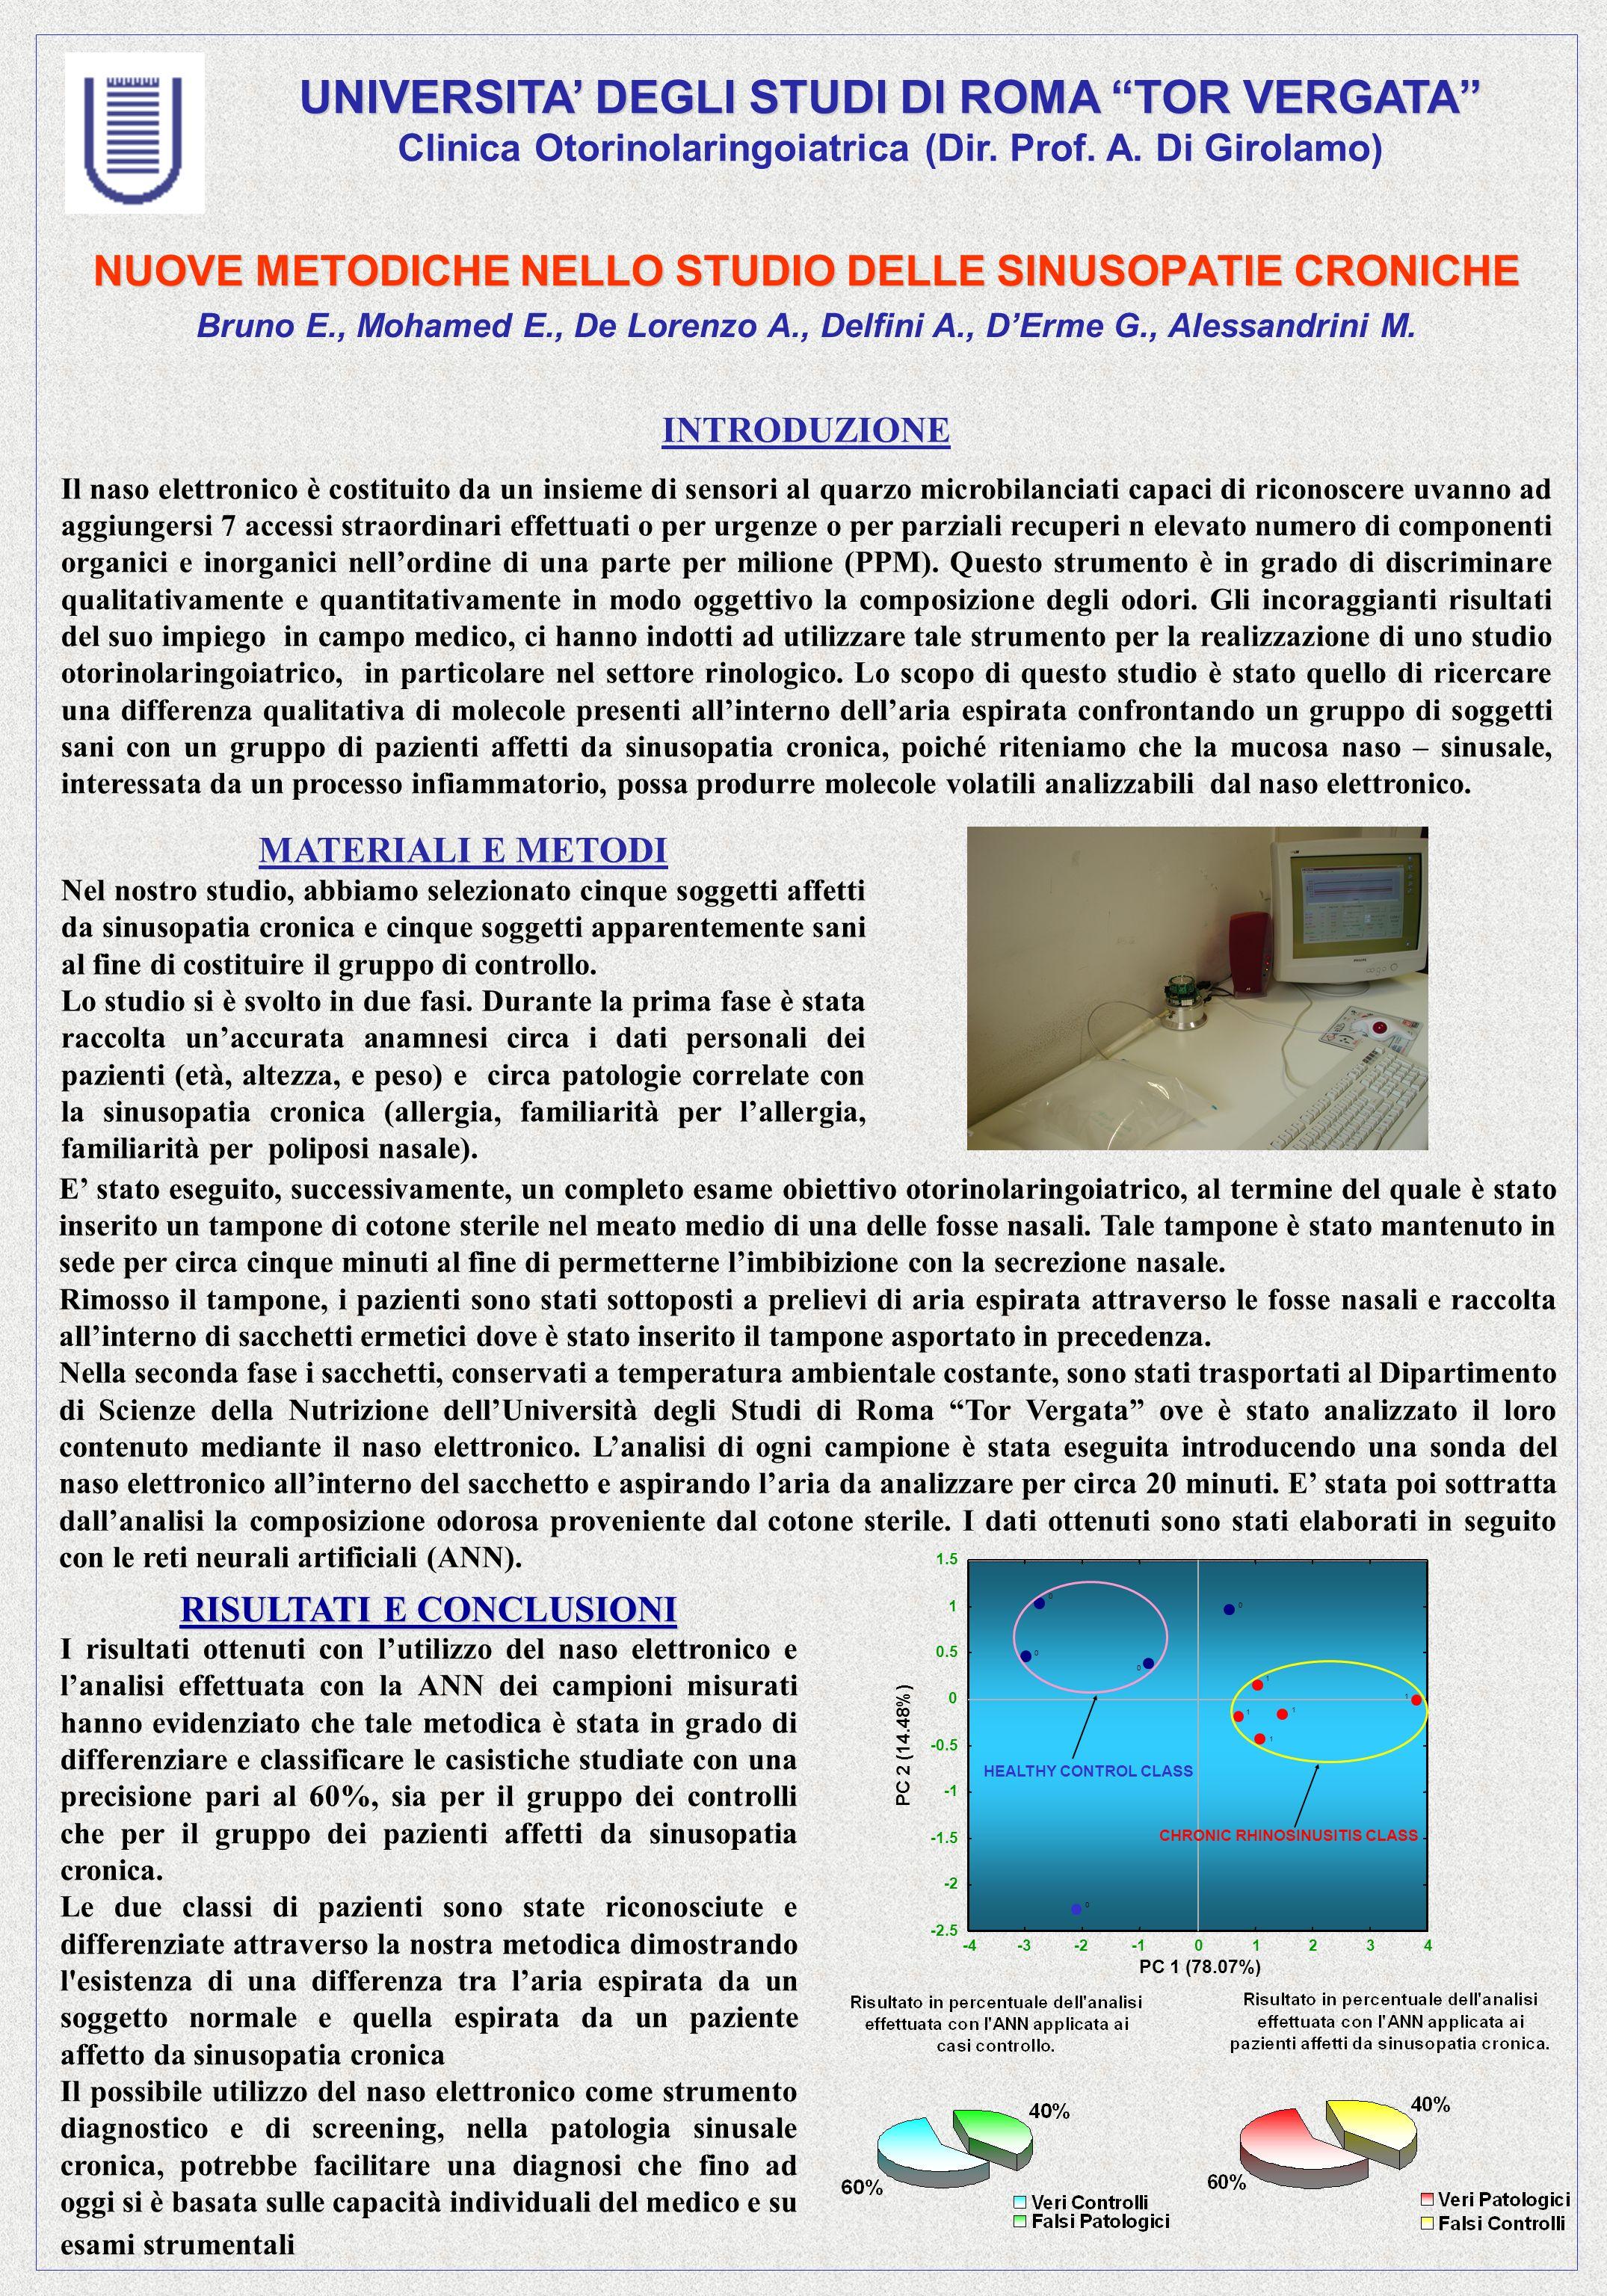 CHRONIC RHINOSINUSITIS CLASS